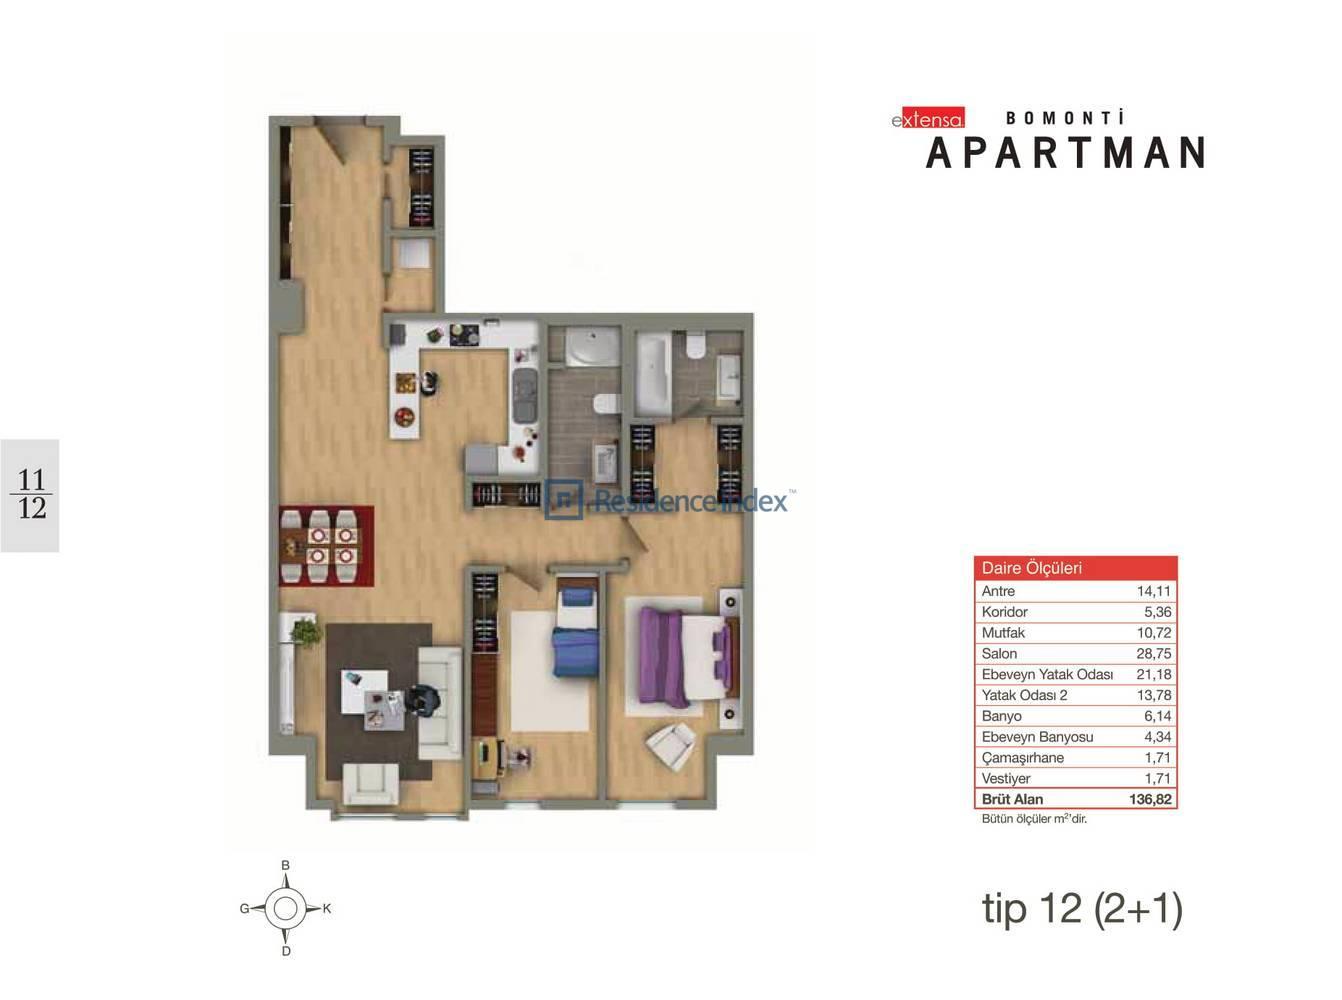 Bomonti Apartmanı Tip 12